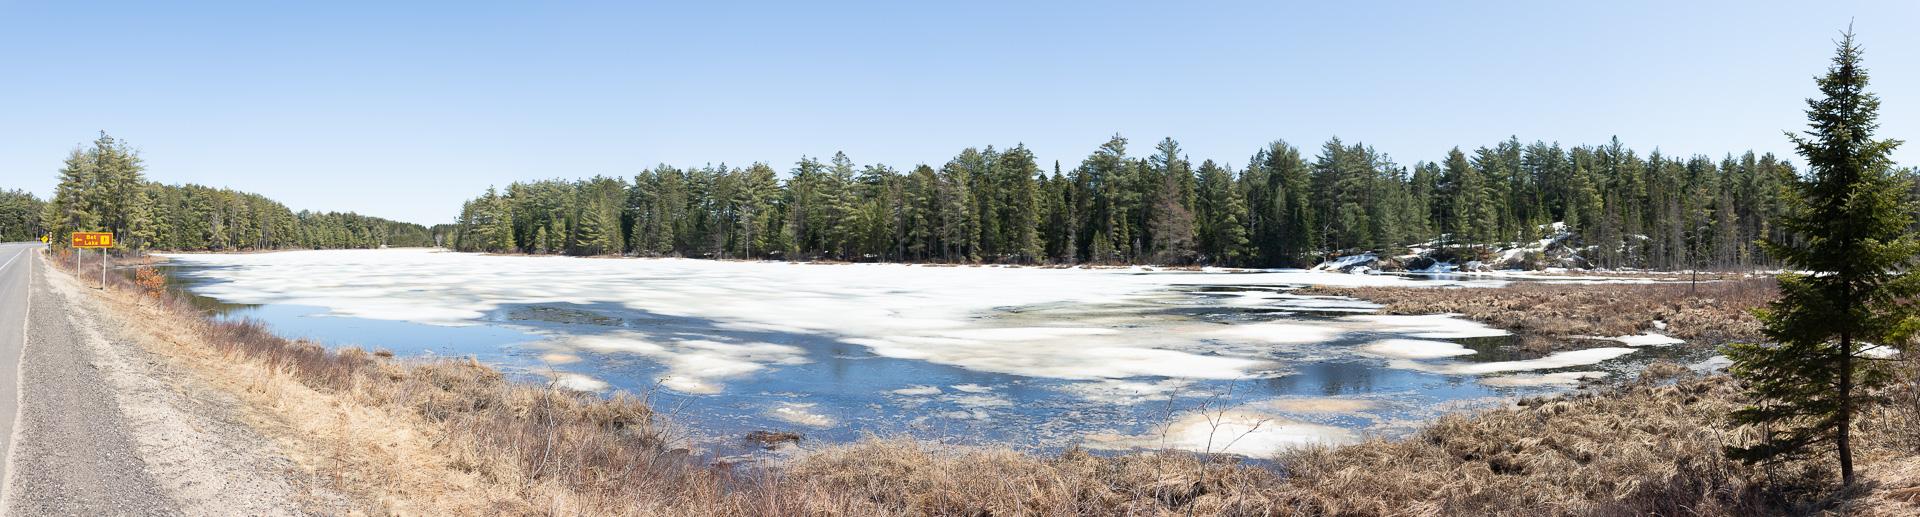 Mew Lake, Algonquin Park